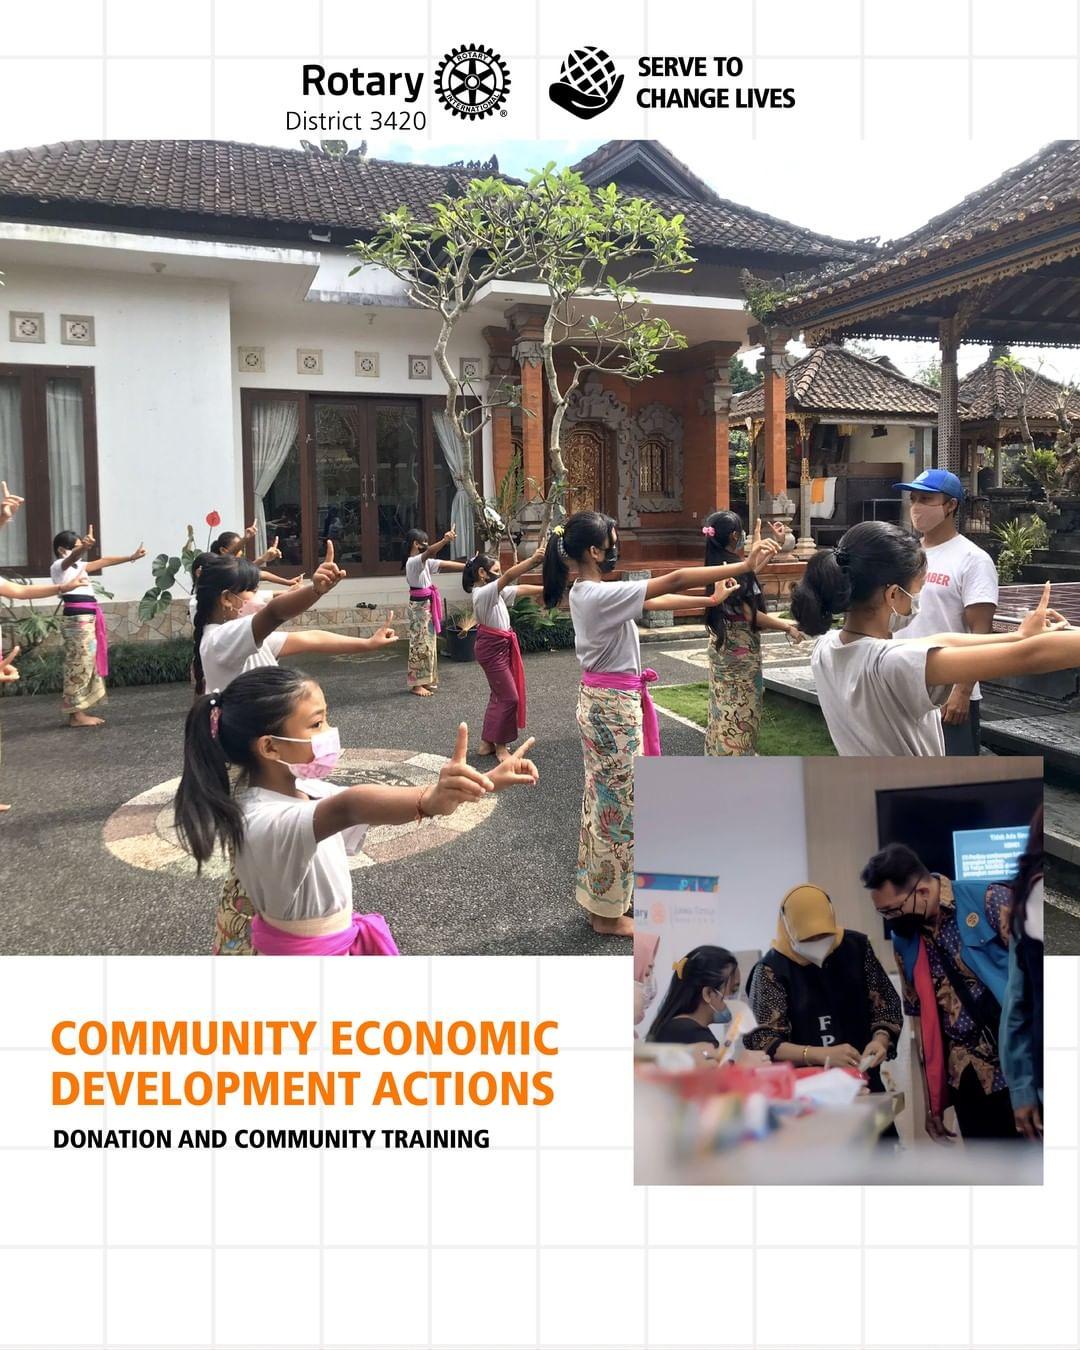 Community Economic Development Actions